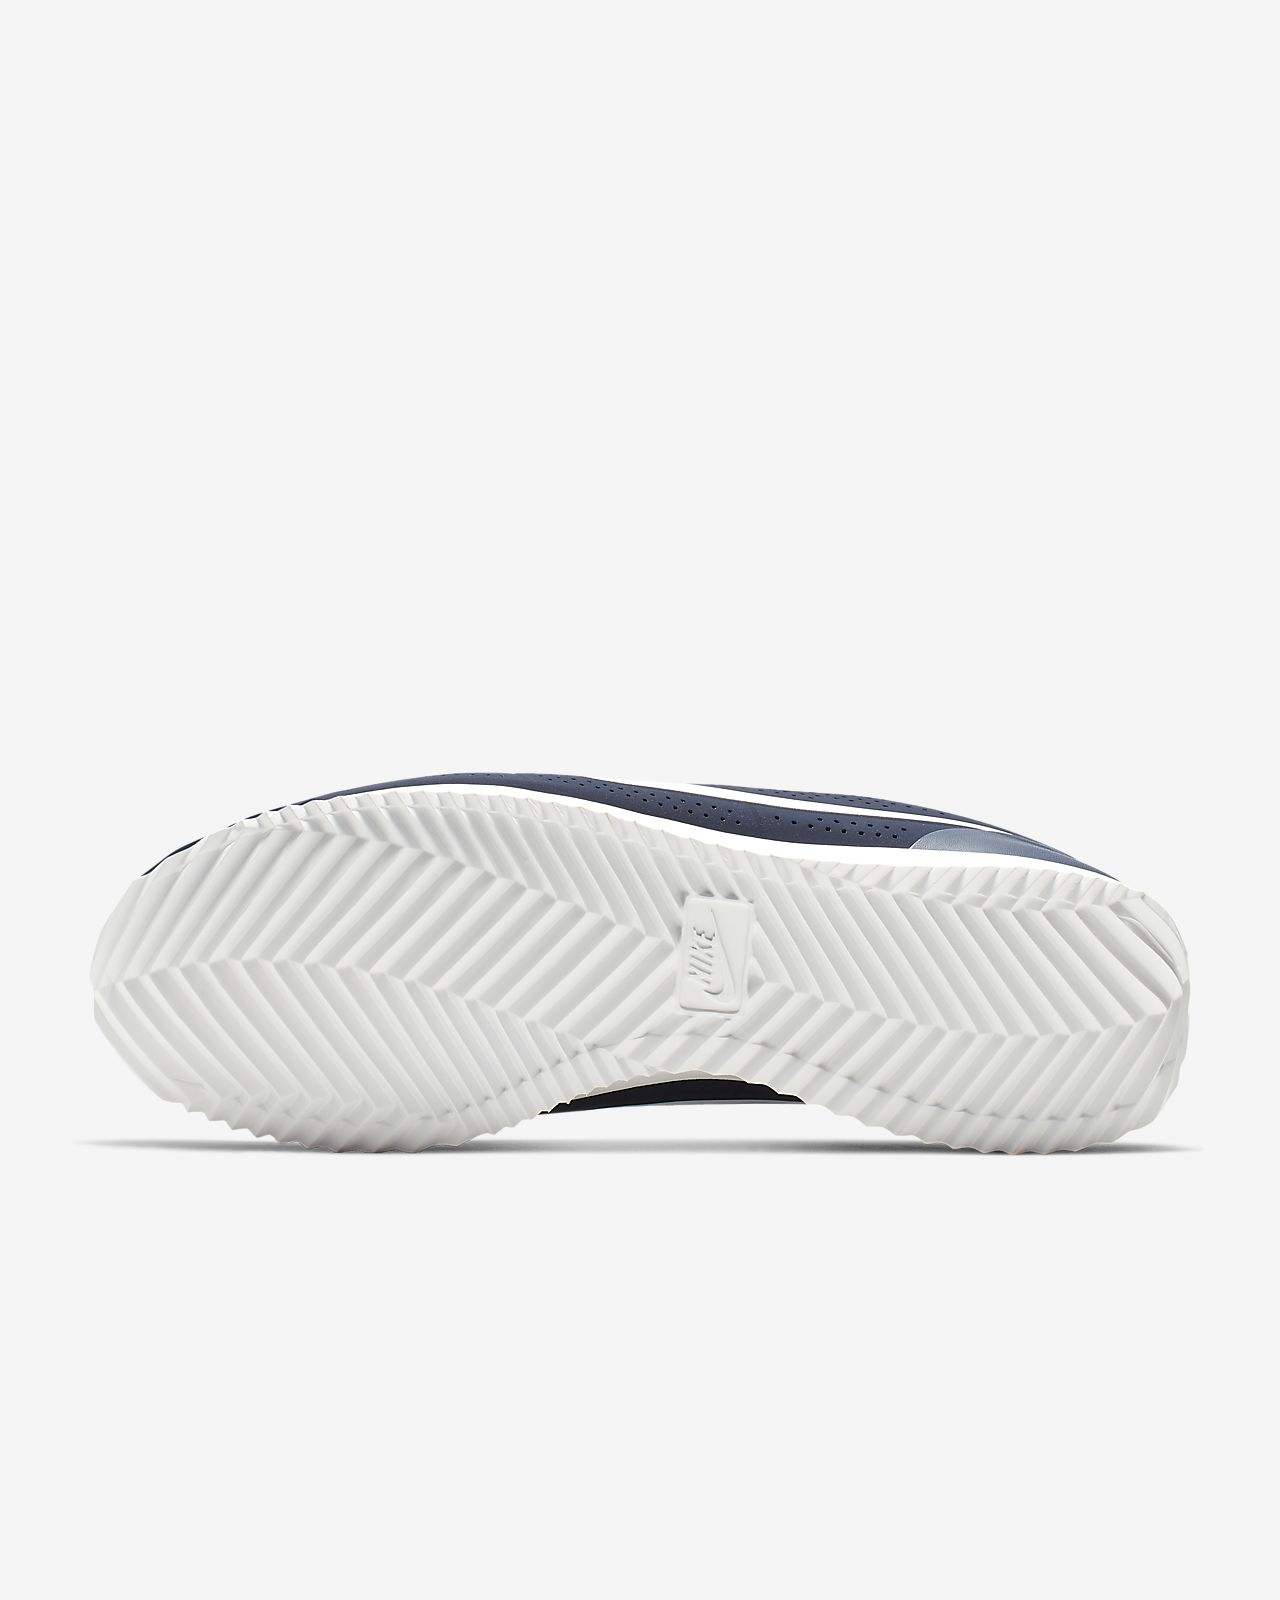 Nike Air Max 90 Ultra Moire 'Triple White'. Nike SNKRS